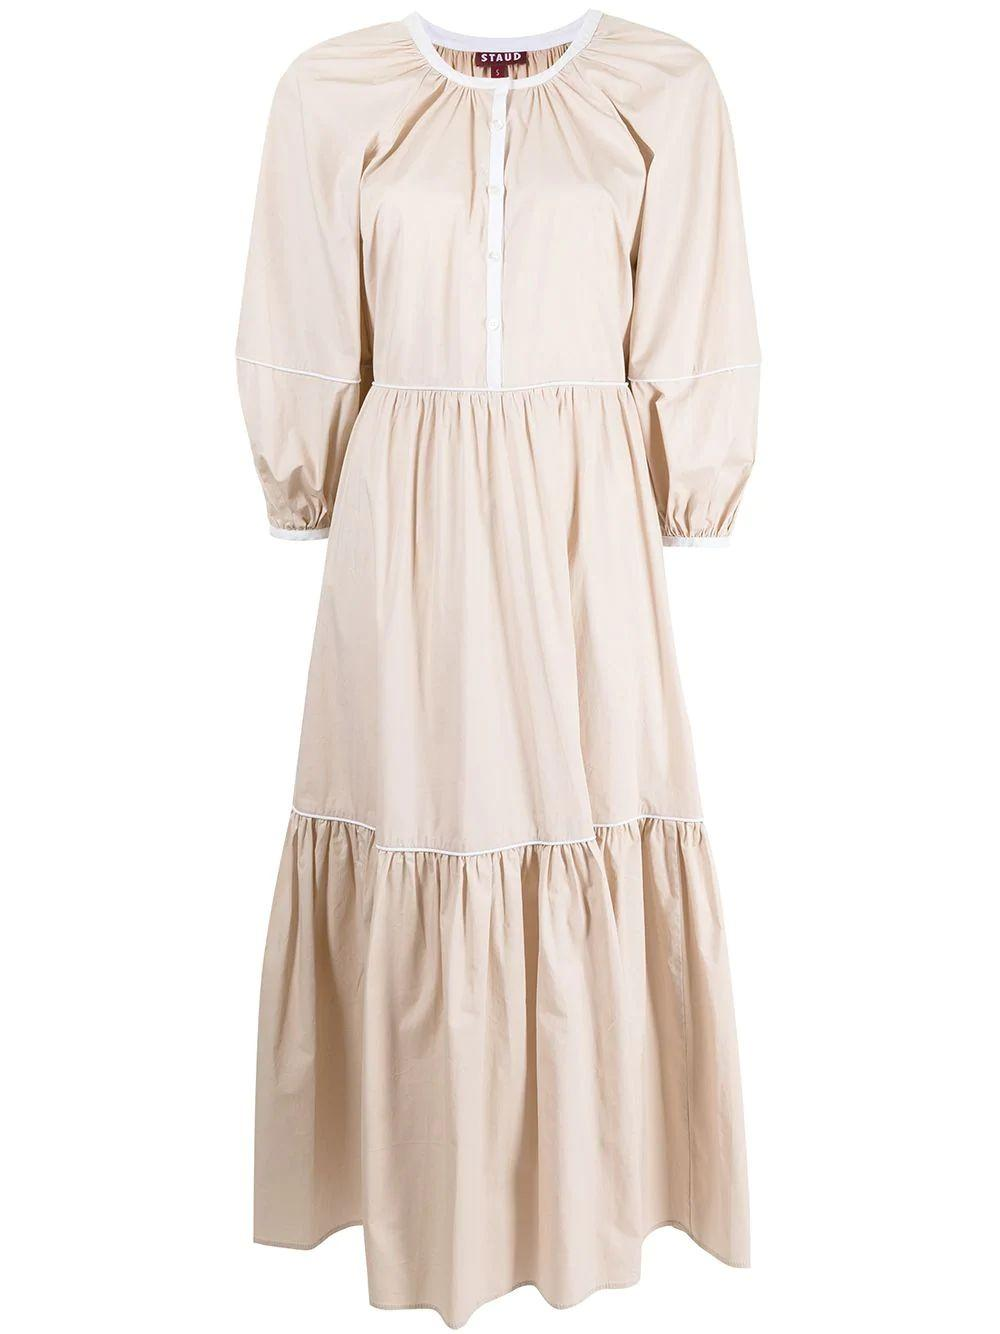 Demi Maxi Dress Item # 90-7328A